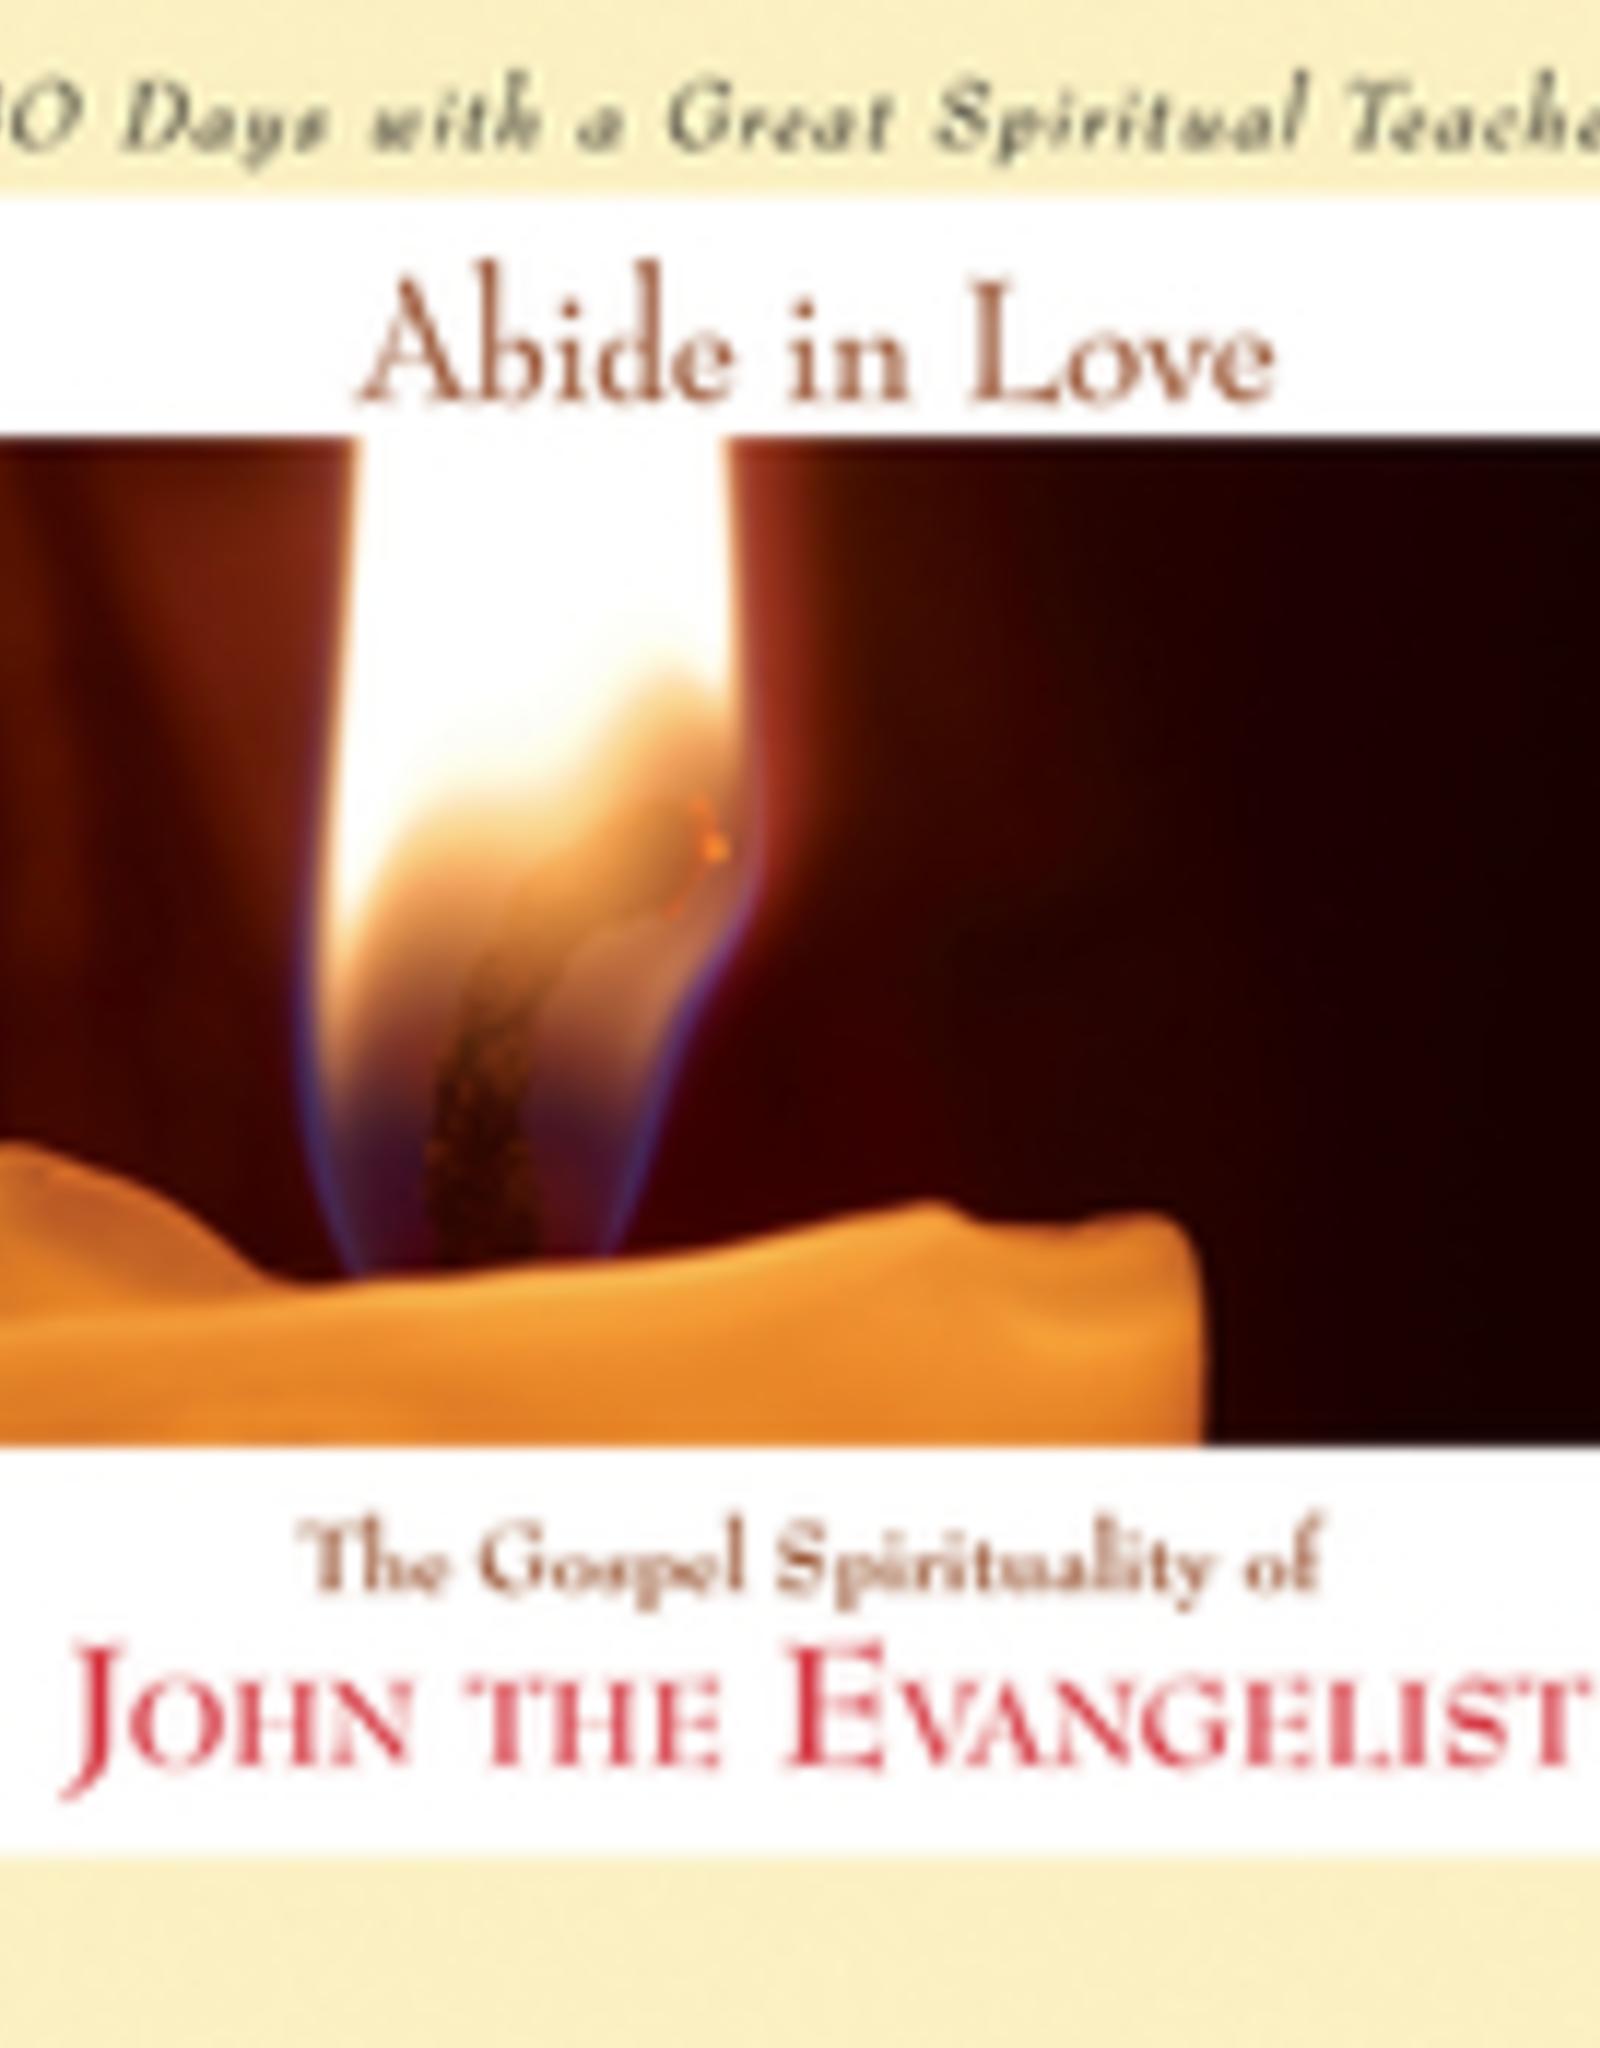 Ave Maria Press Abide in Love, by St. John the Evangelist, edited by John Kirvan (paperback)